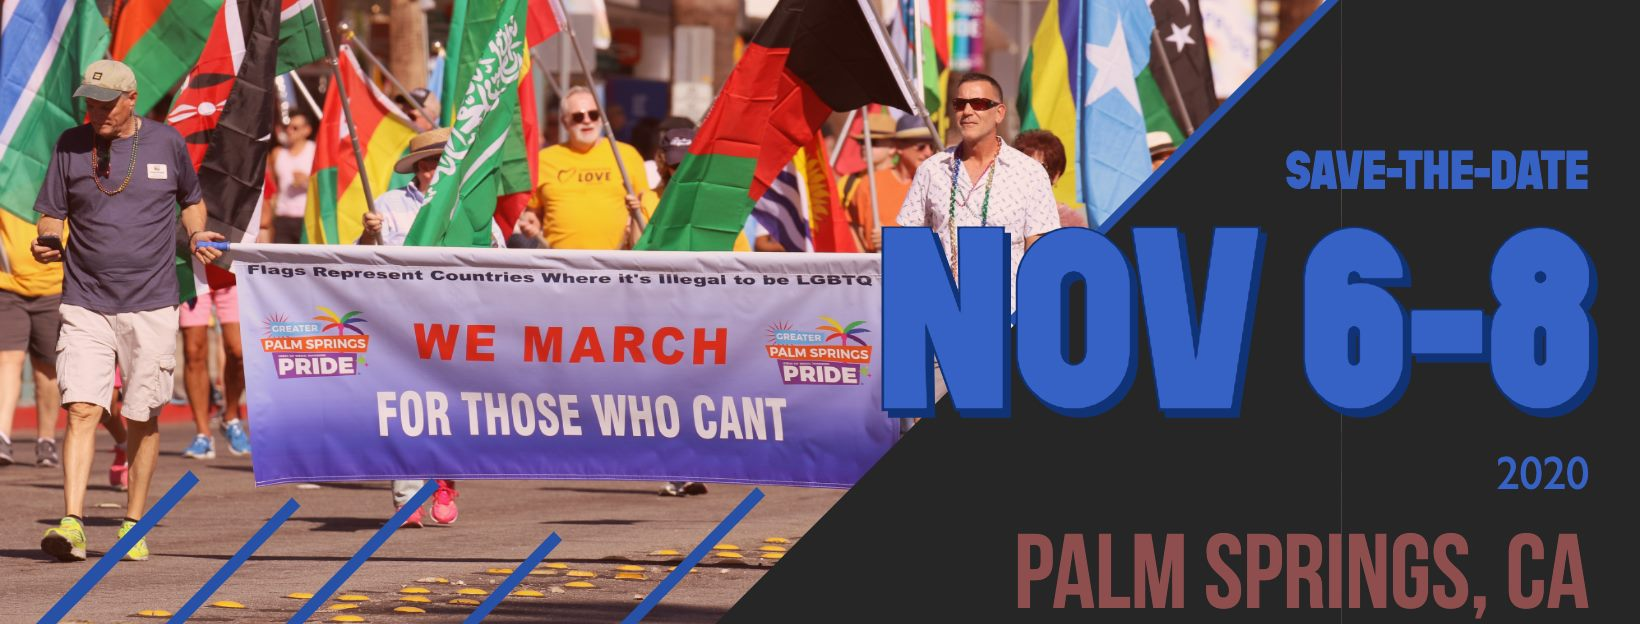 Palm Springs Pride 2020